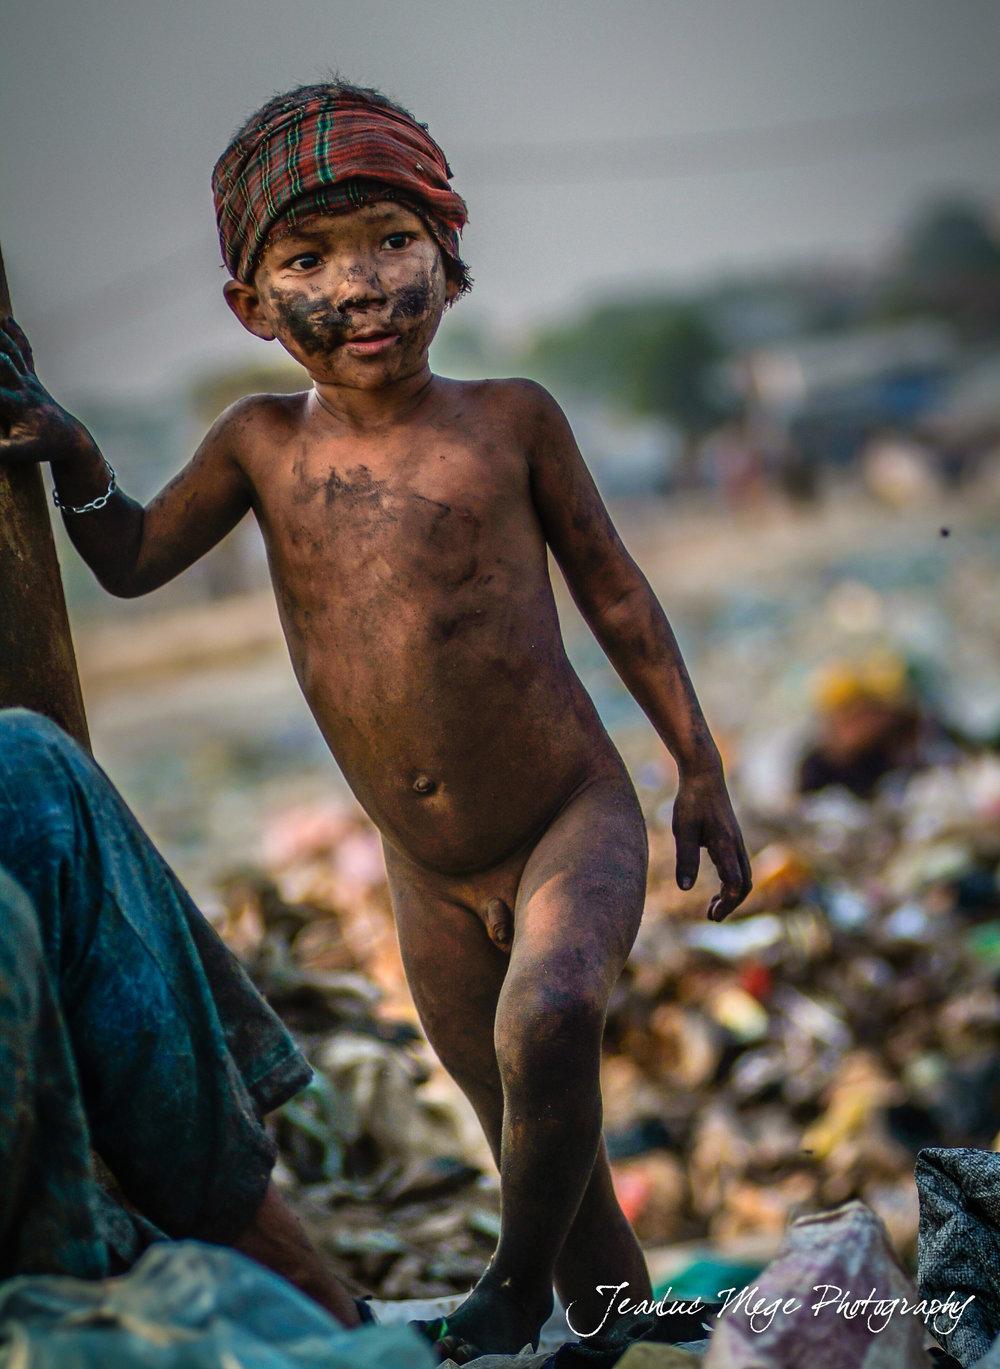 Jean Luc Mege Cambodia-9291.jpg